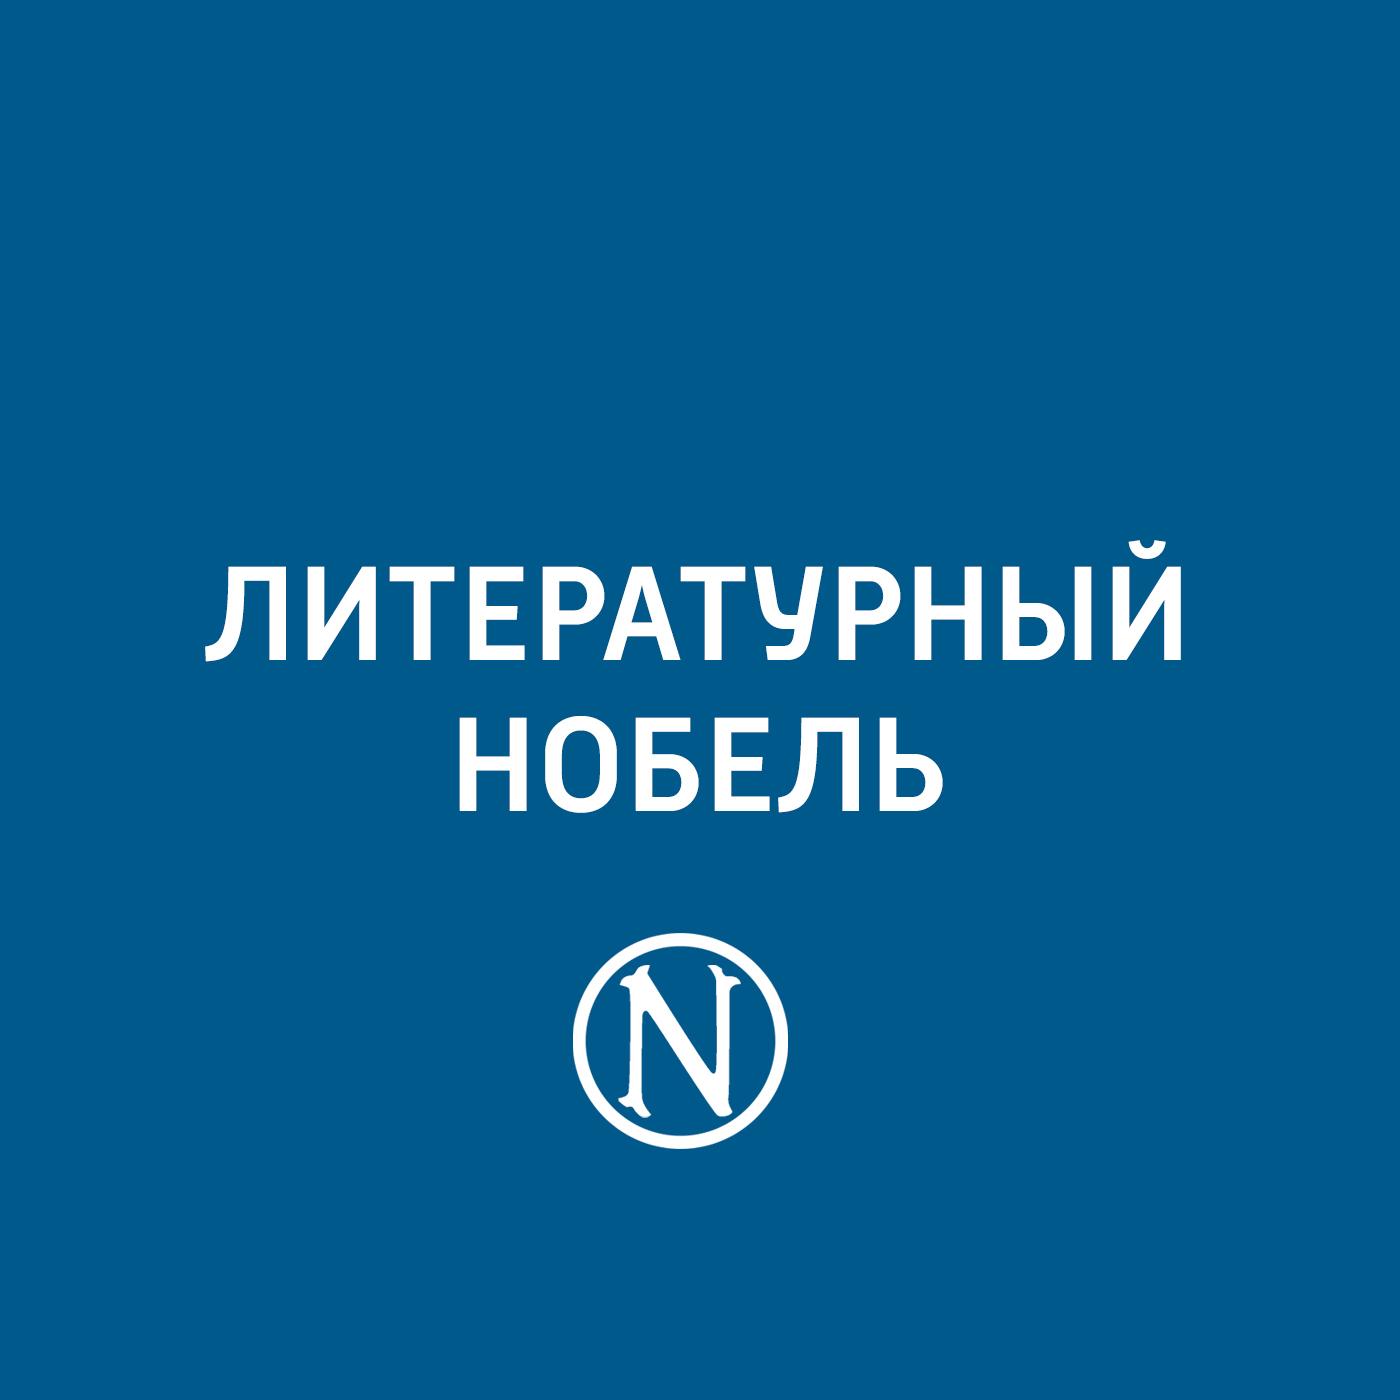 Евгений Стаховский Рабиндранат Тагор рабиндранат тагор берег бибхи